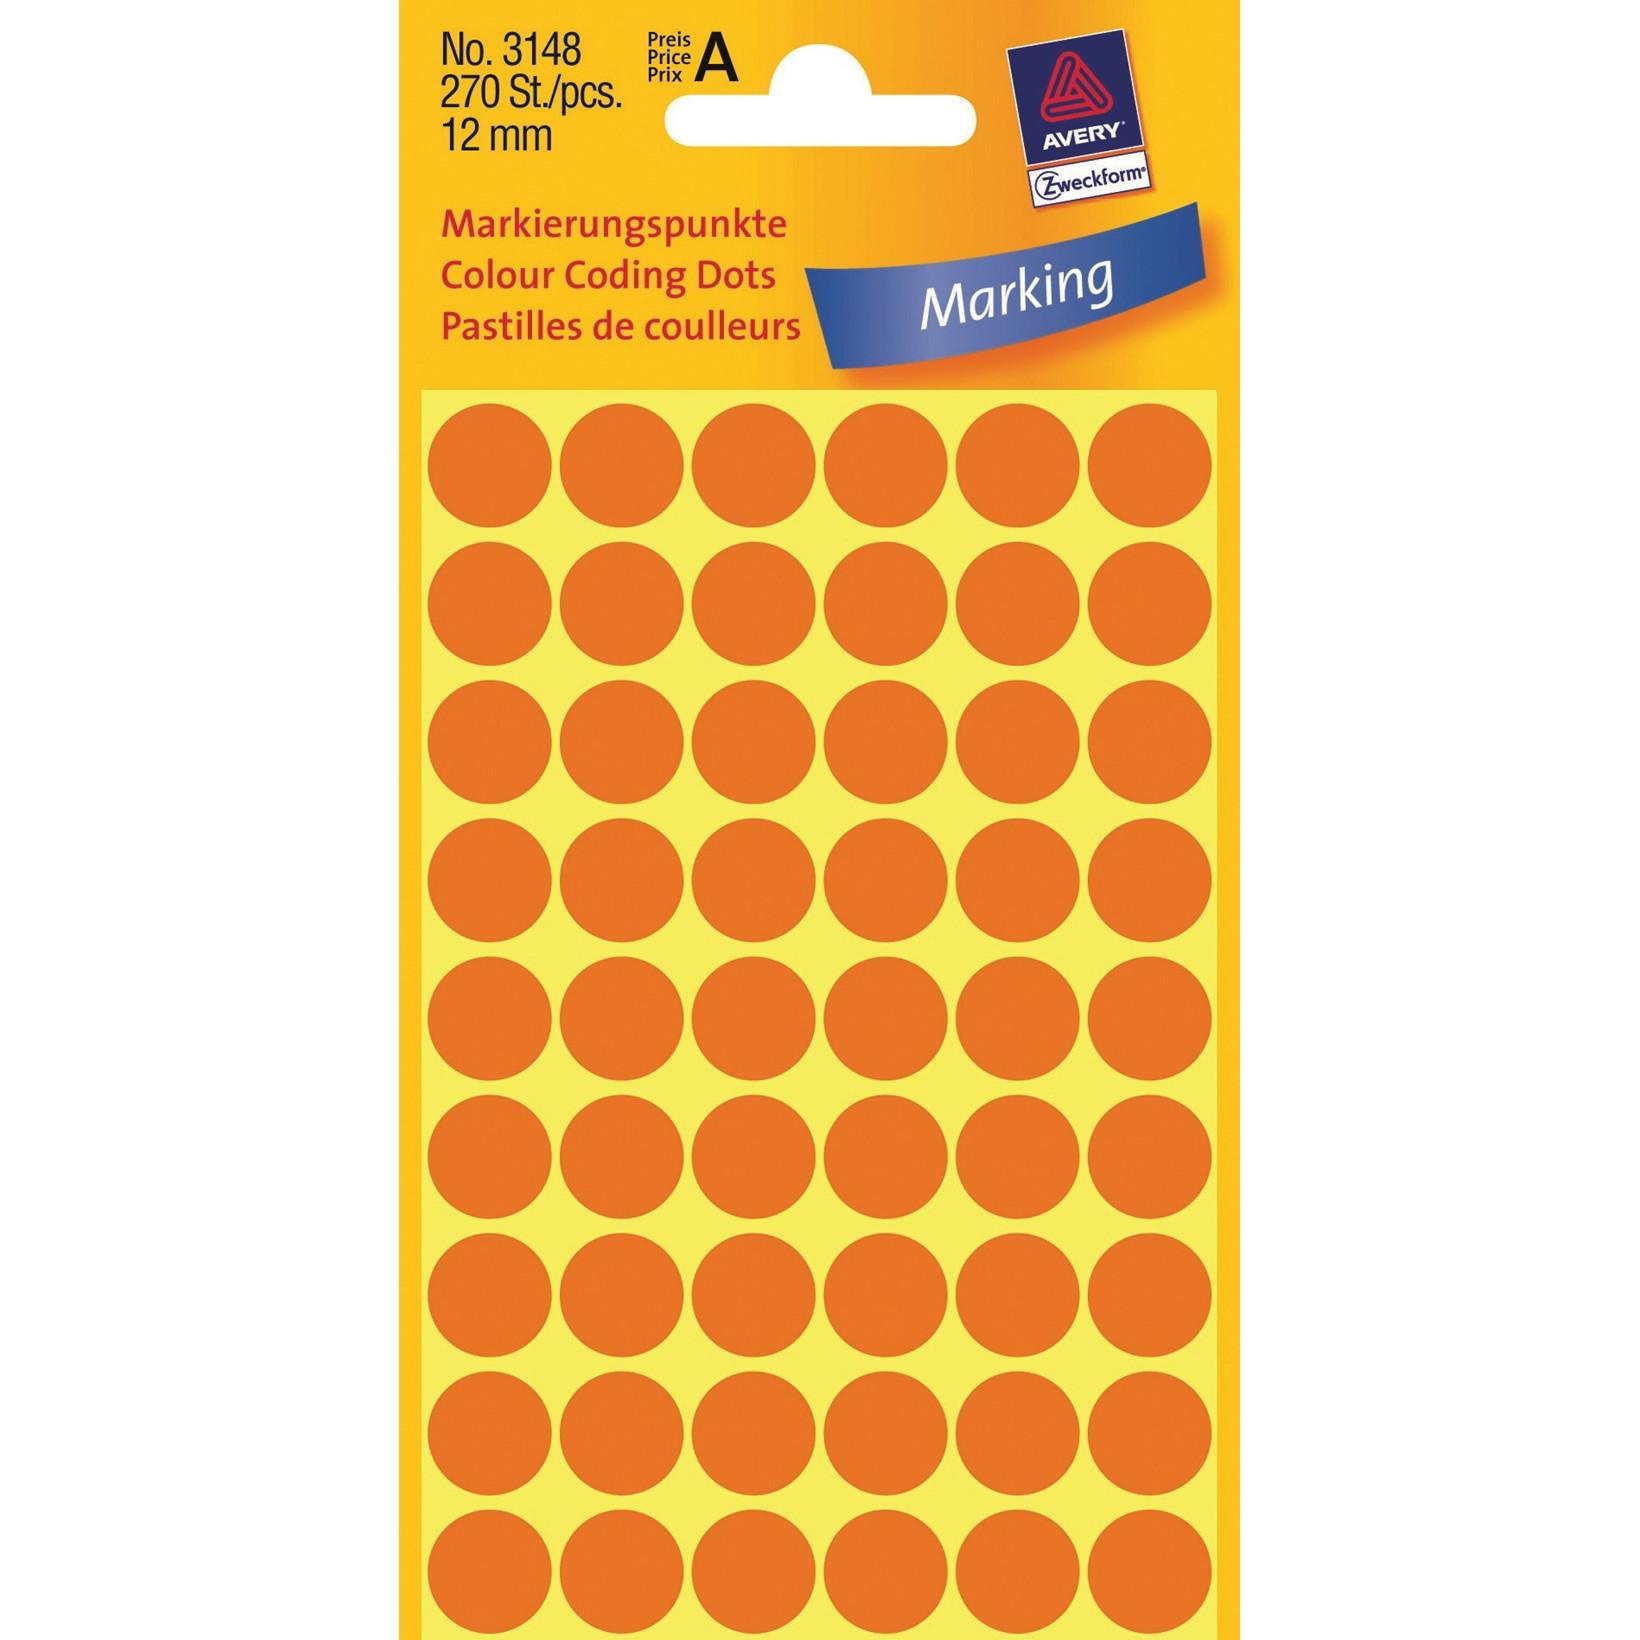 Avery 3148  - Runde labels neon orange Ø: 12 mm - 270 stk